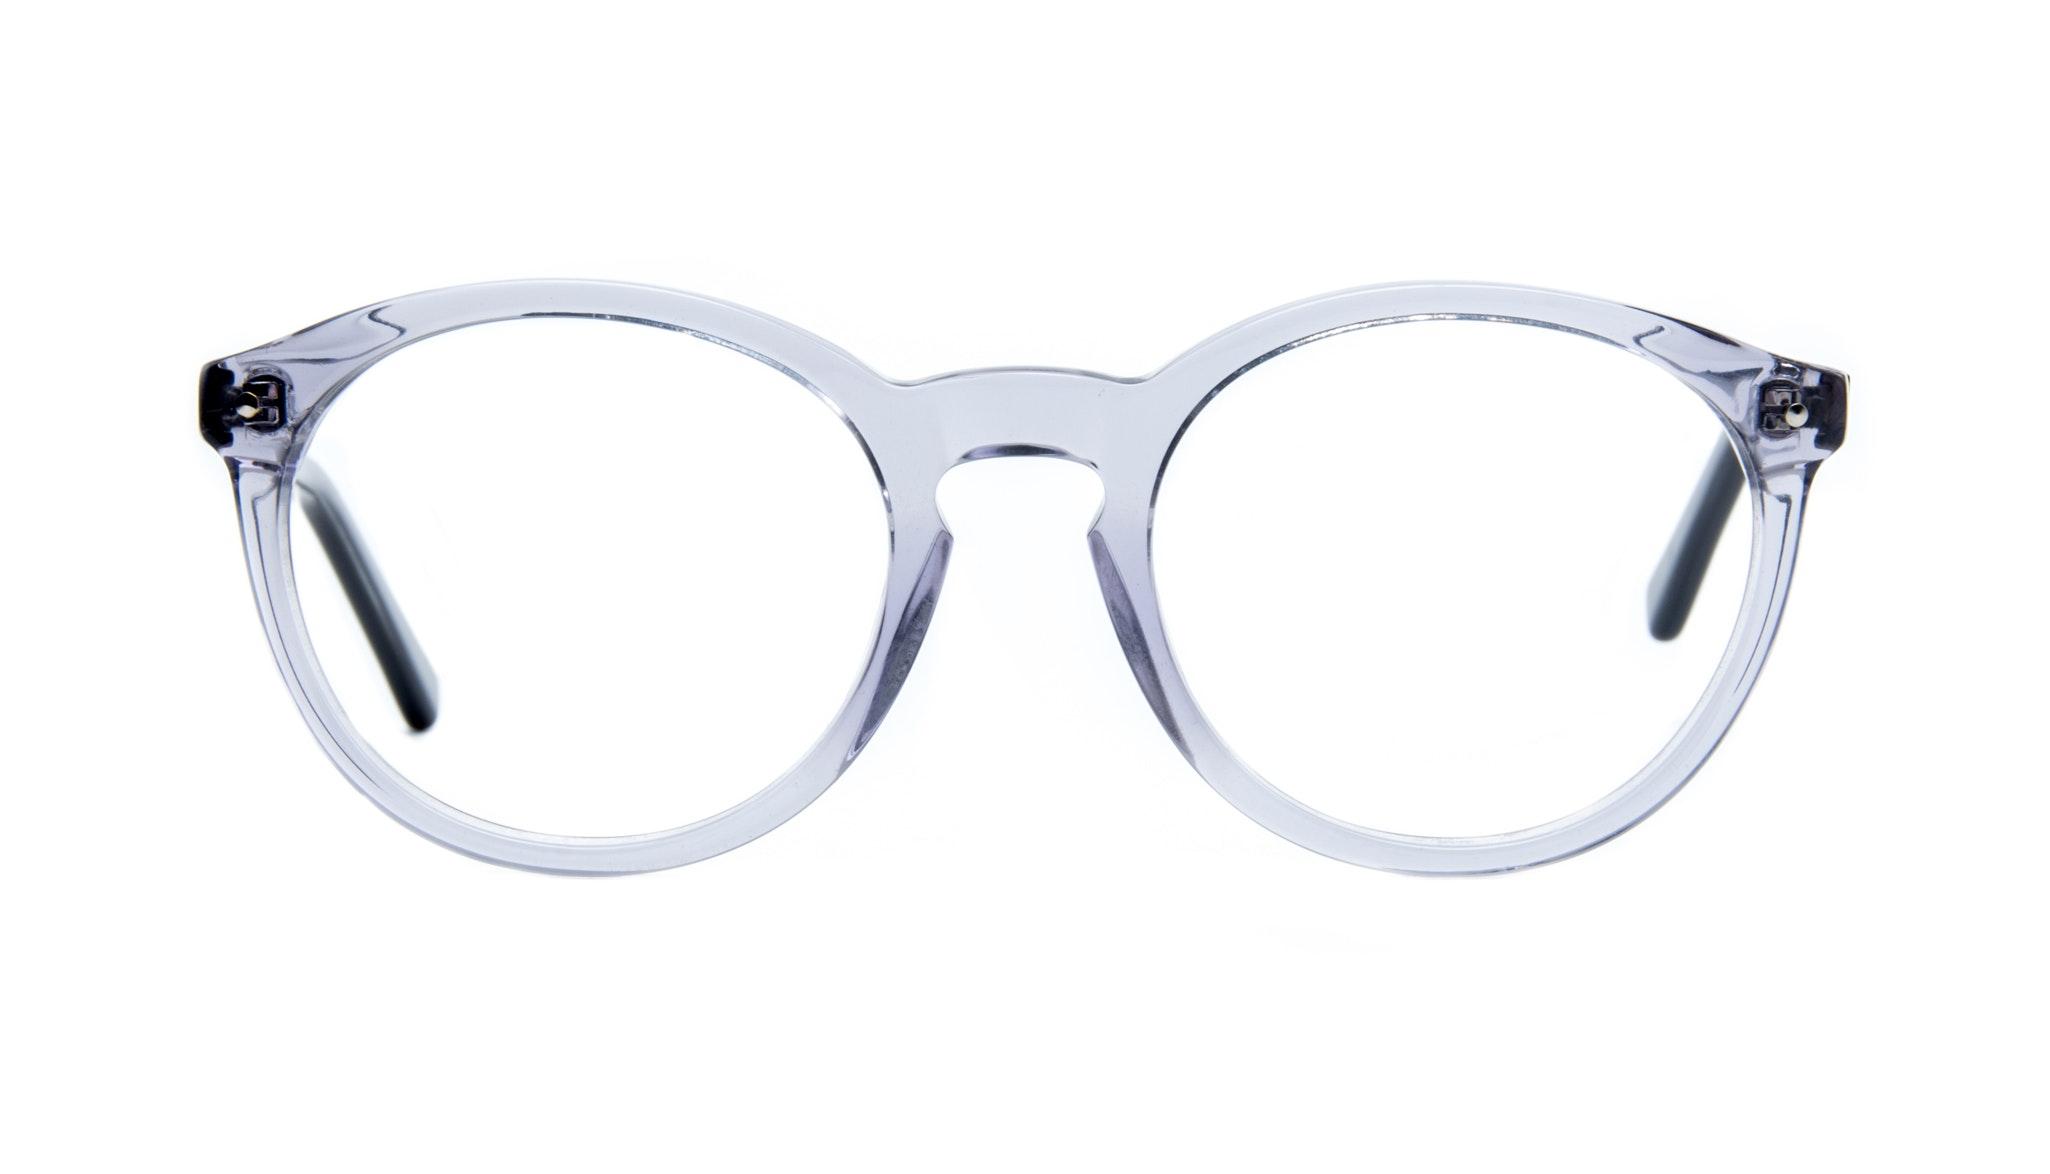 Affordable Fashion Glasses Round Eyeglasses Women Glow Grey Metal Front